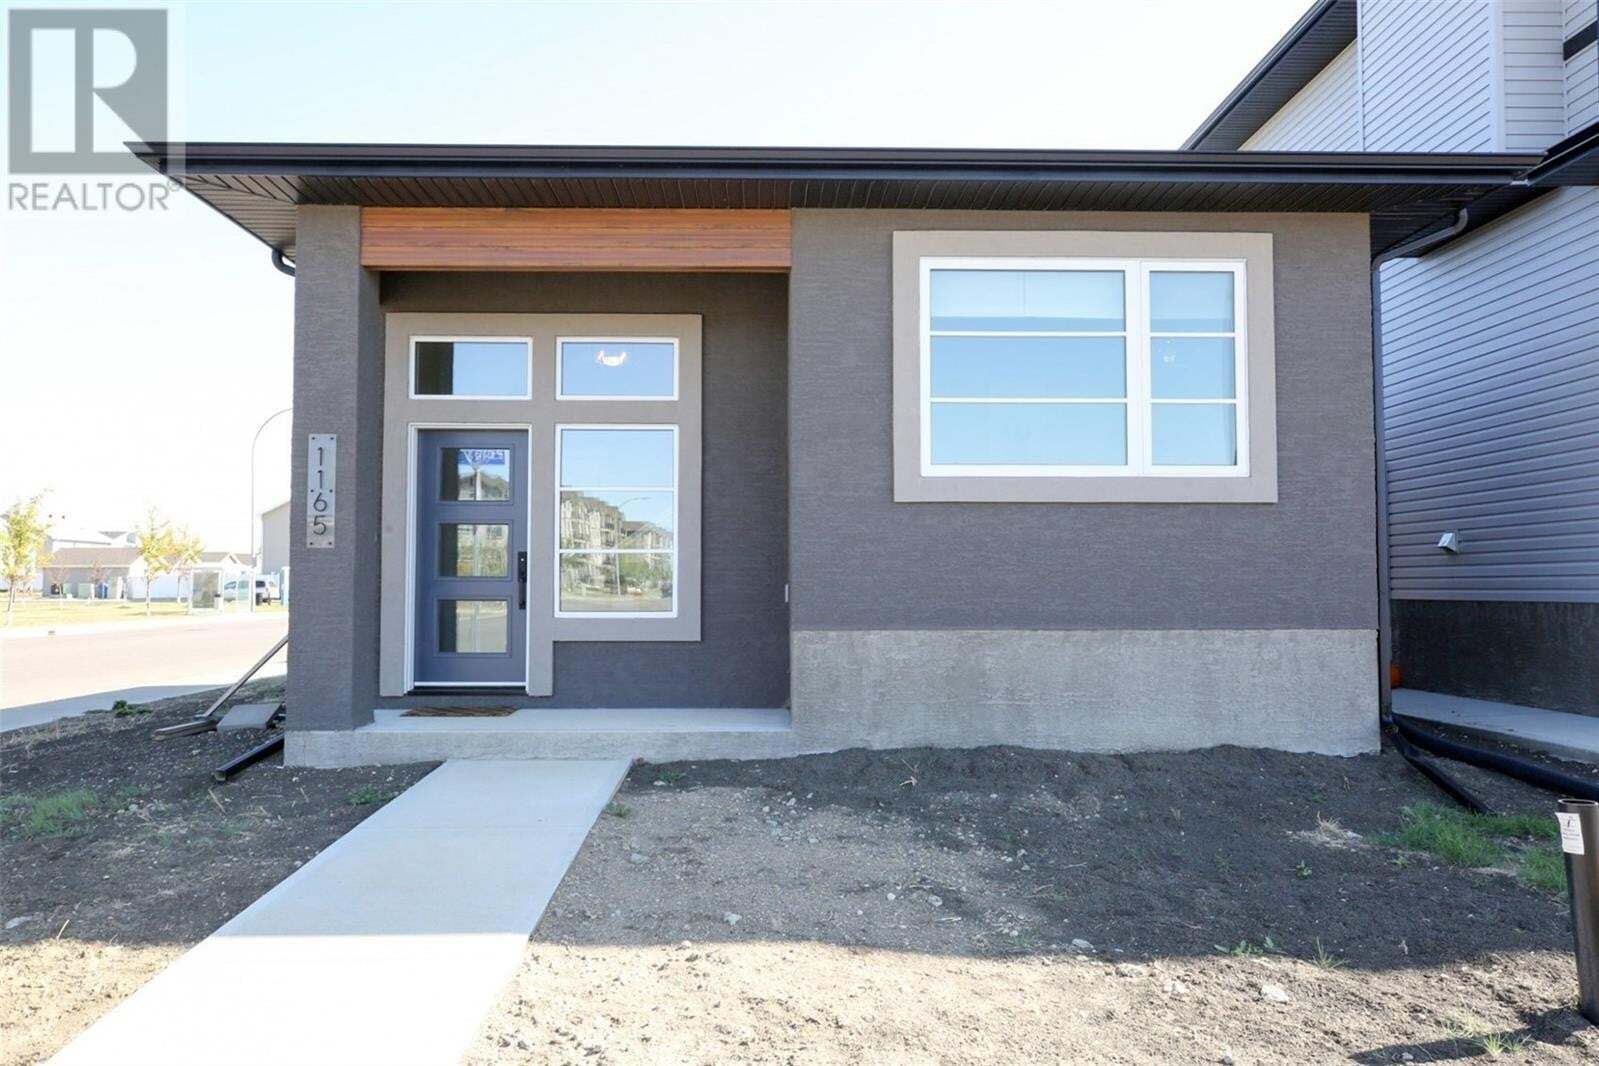 House for sale at 1165 Poley St N Regina Saskatchewan - MLS: SK827965